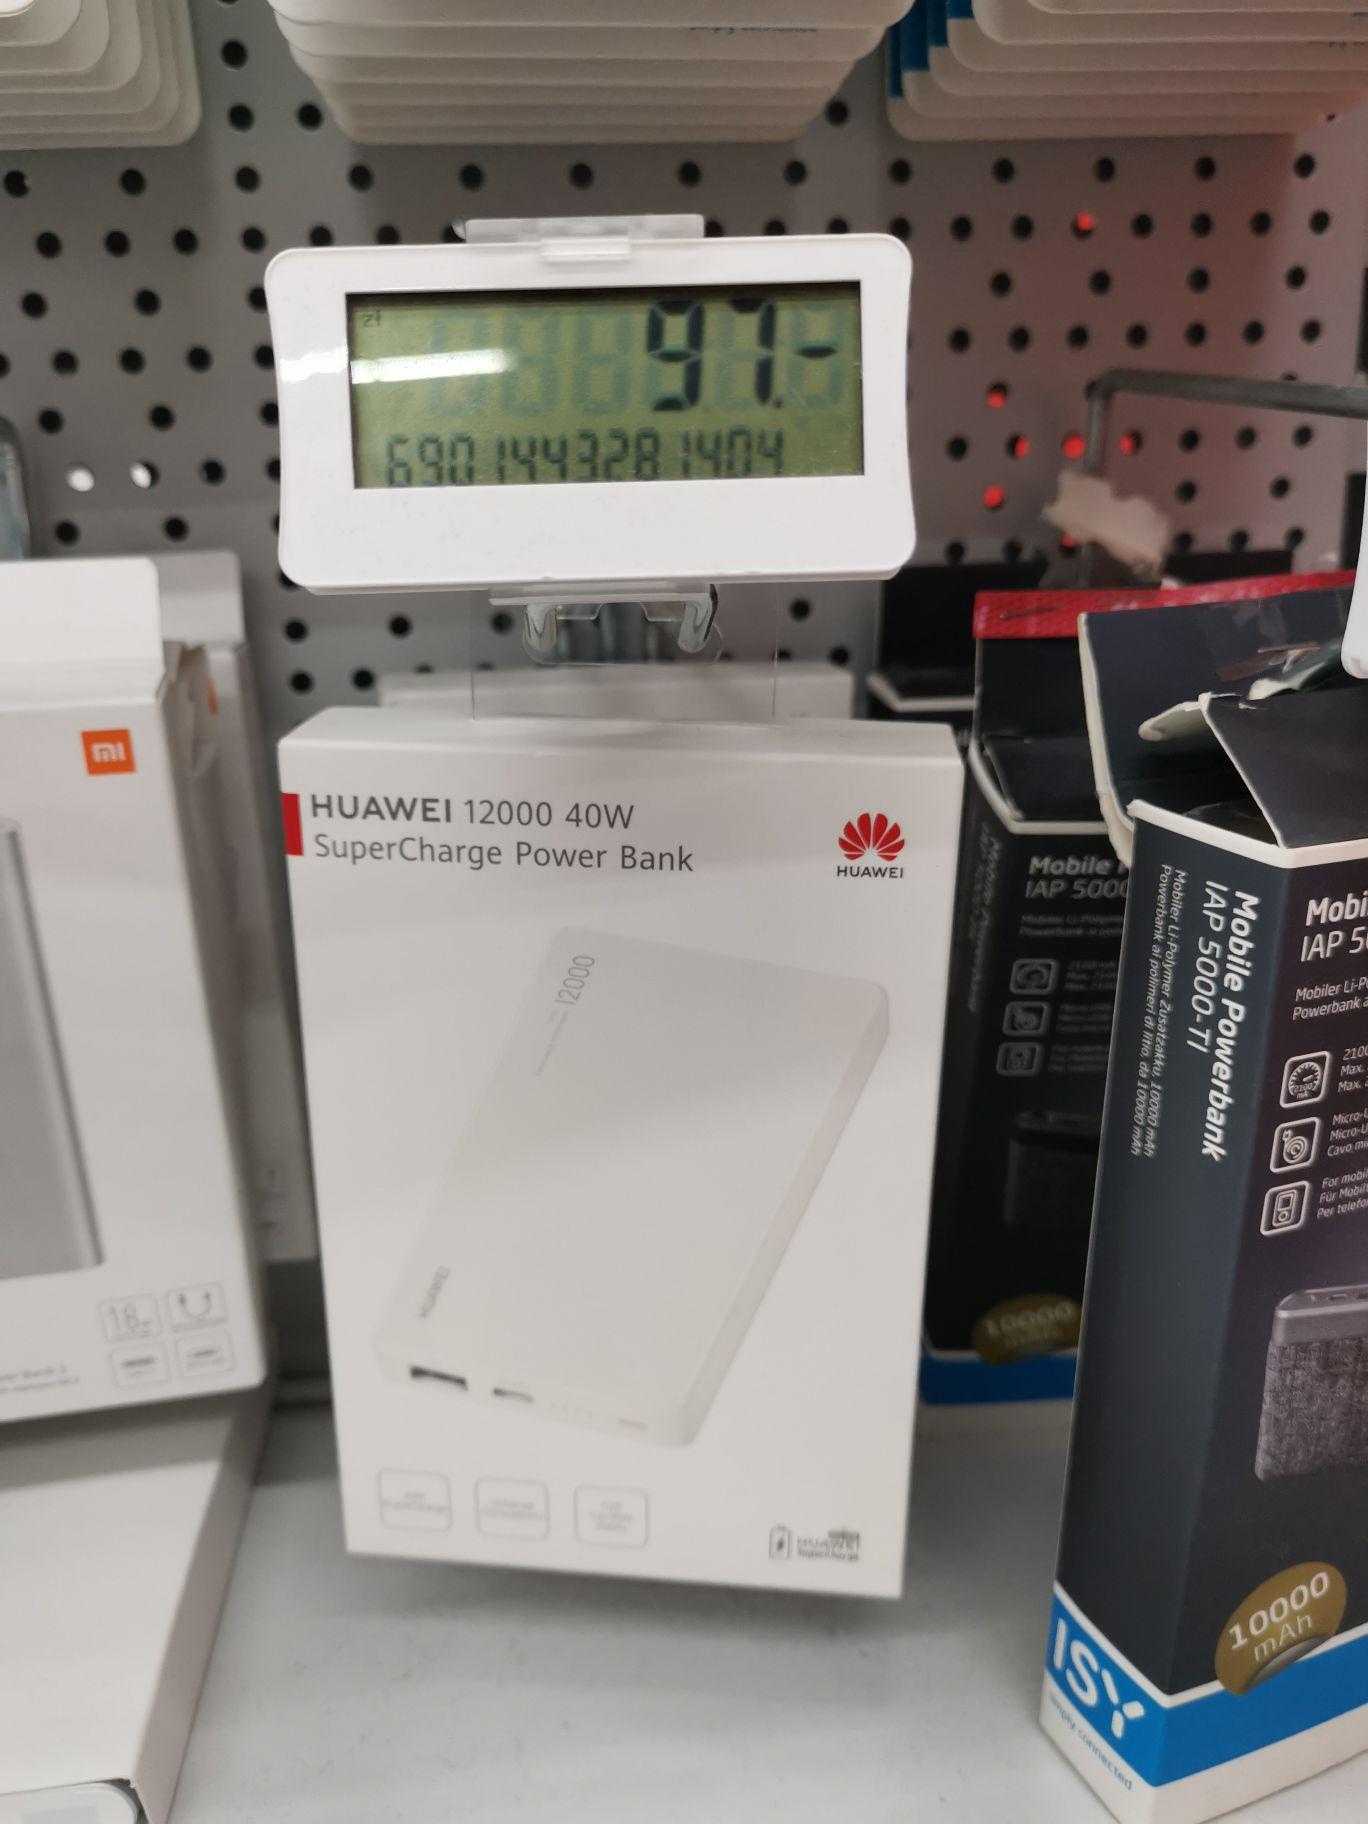 Powerbank Huawei 12000 40W cp12s w MediaMarkt M1